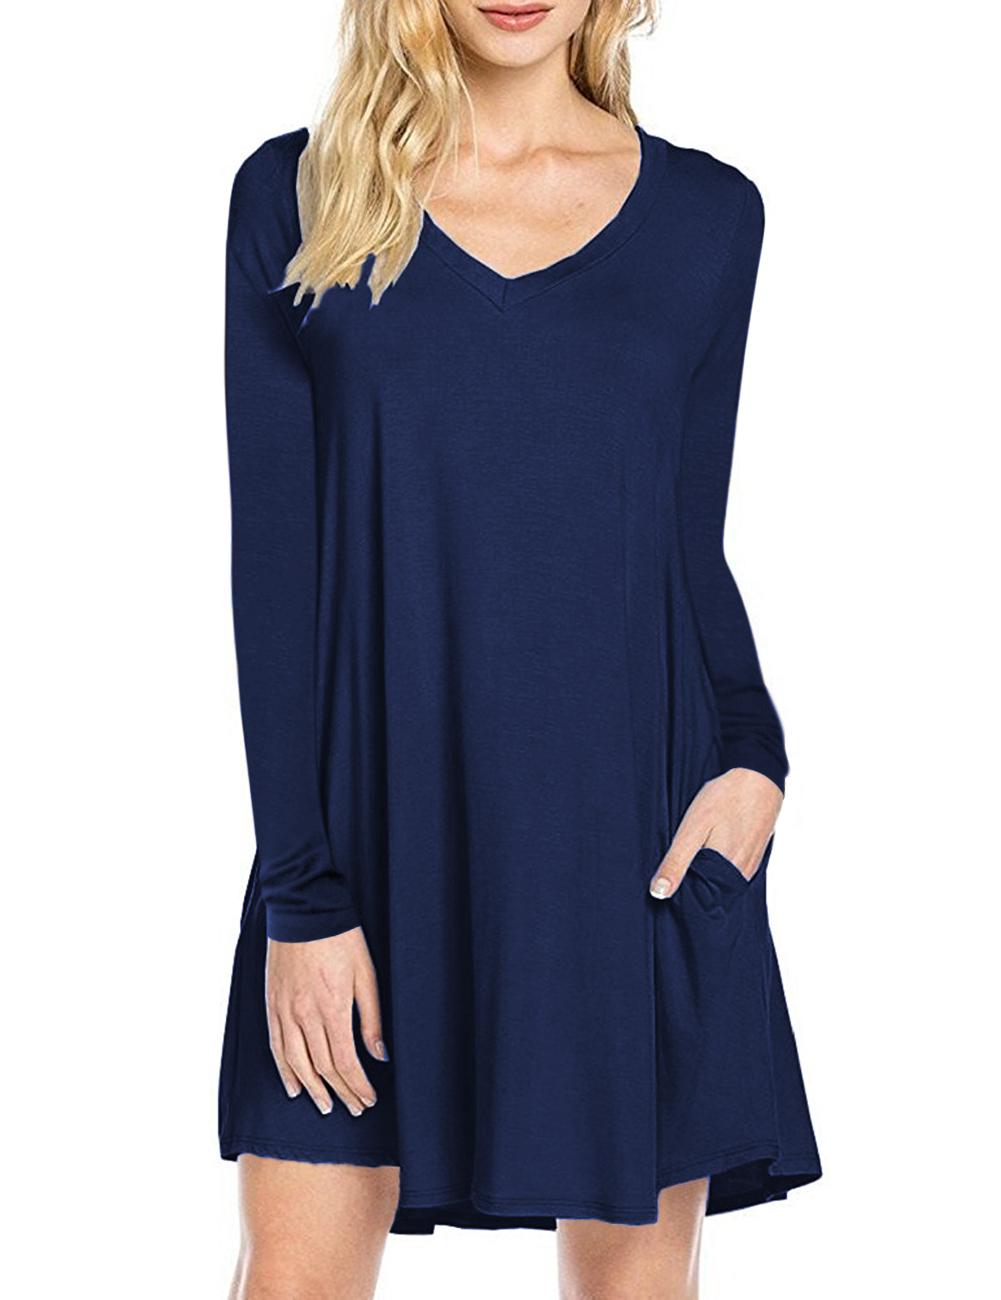 [US Direct] Leadingstar Women's Long Sleeve V-neck Swing Pocket Casual T-shirt Dress Royal blue_L